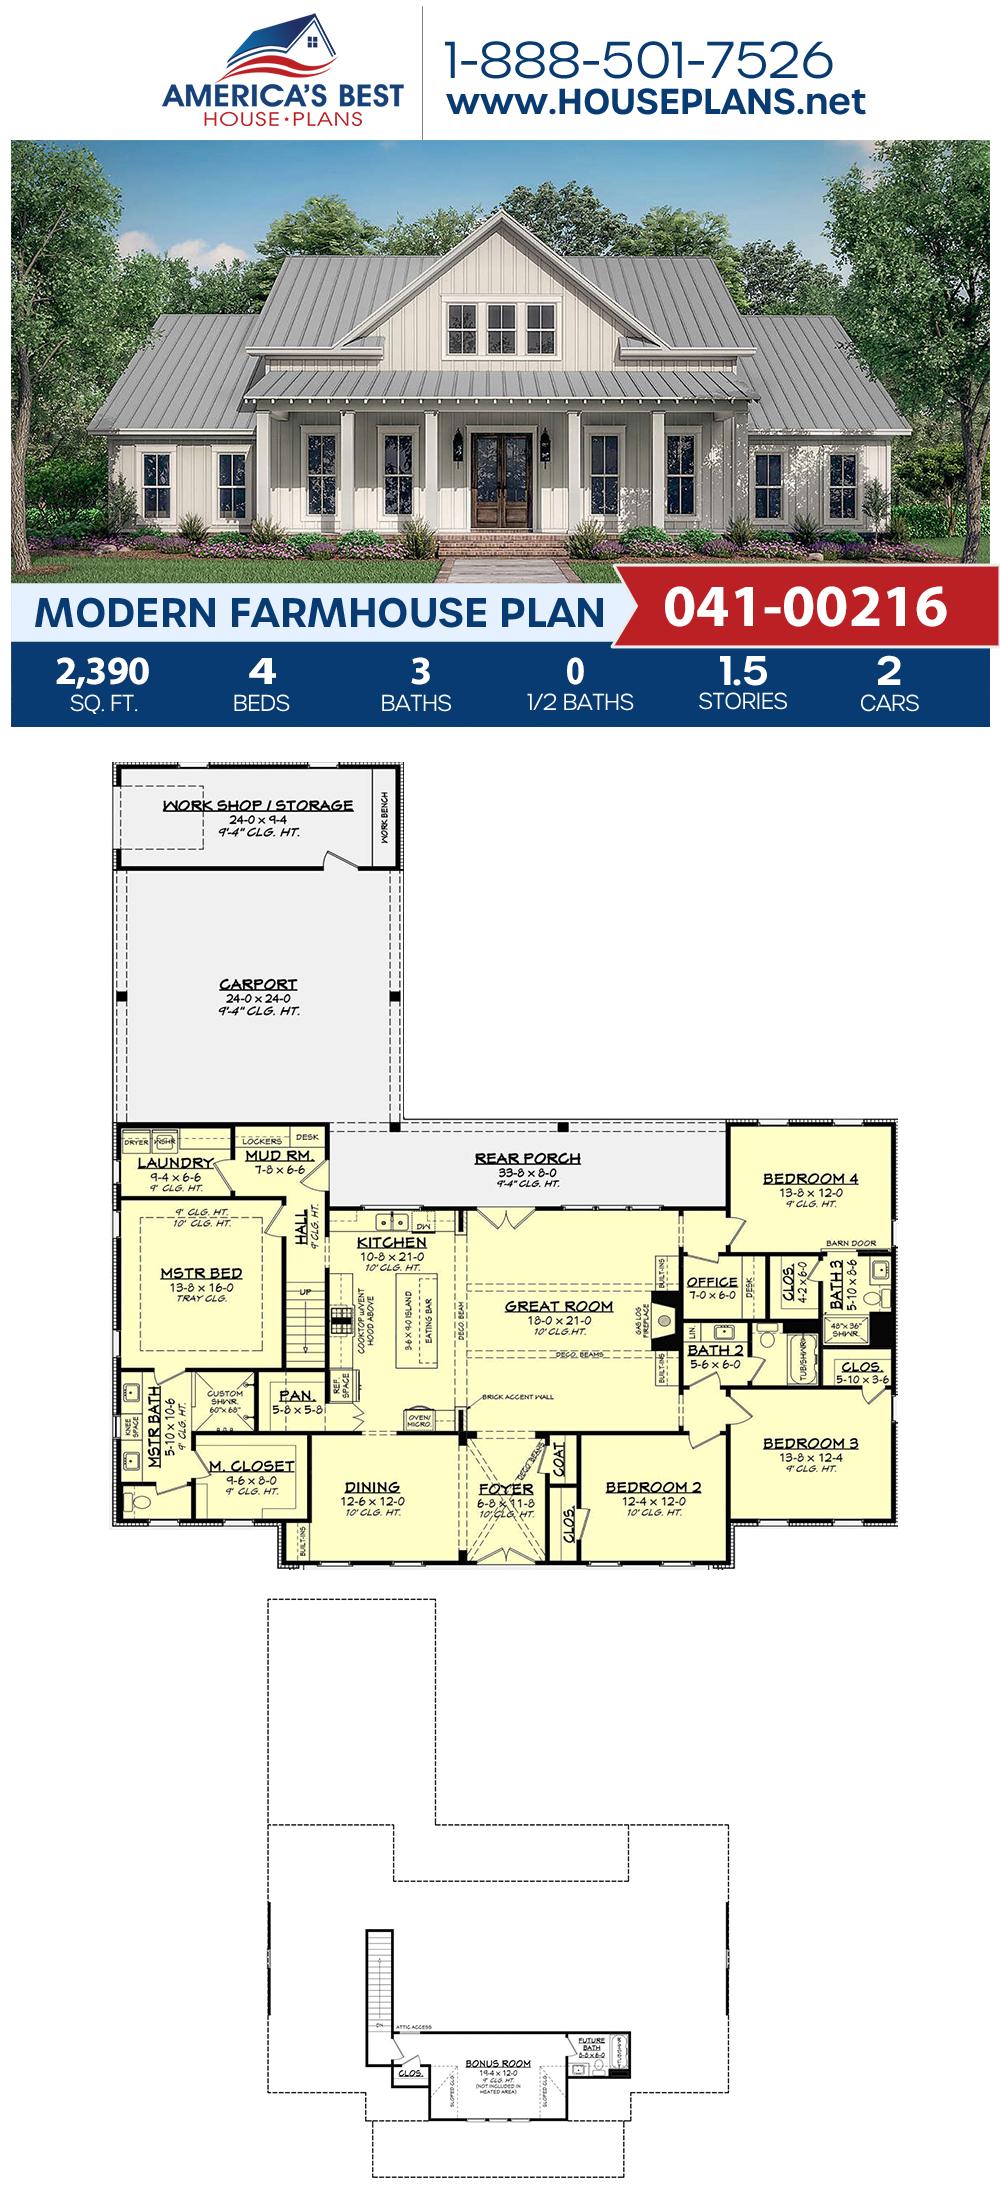 House Plan 041 00216 Modern Farmhouse Plan 2 390 Square Feet 4 Bedrooms 3 Bathrooms In 2020 Modern Farmhouse Plans House Plans Farmhouse Affordable House Plans